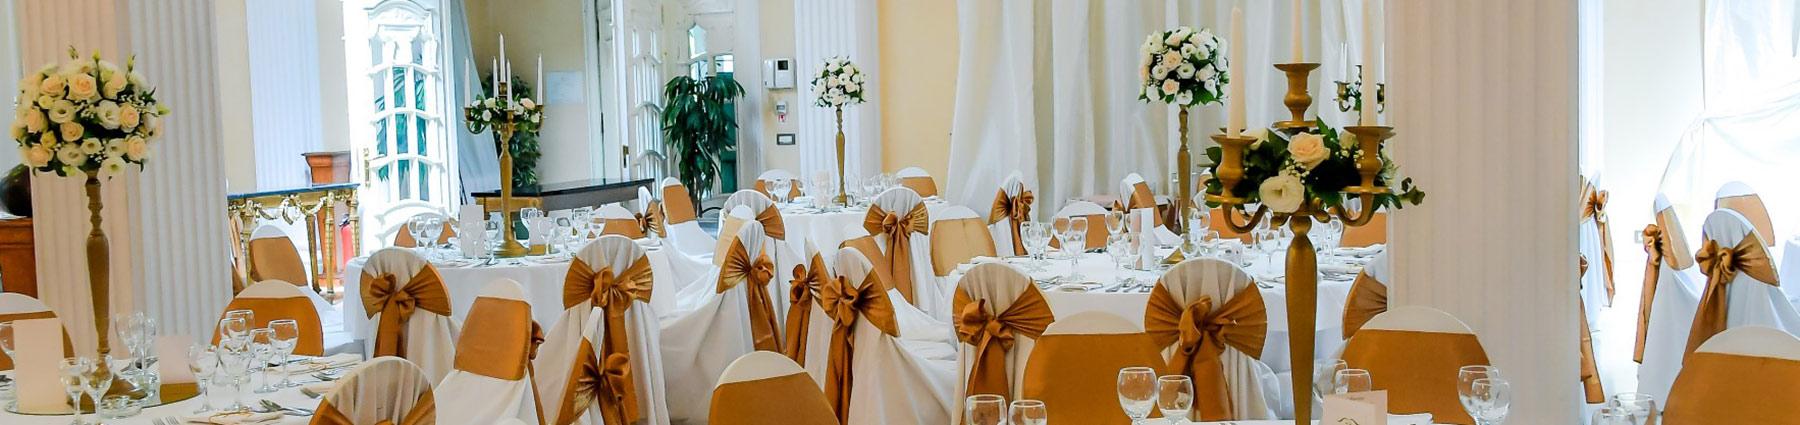 Restaurant Club Jelena